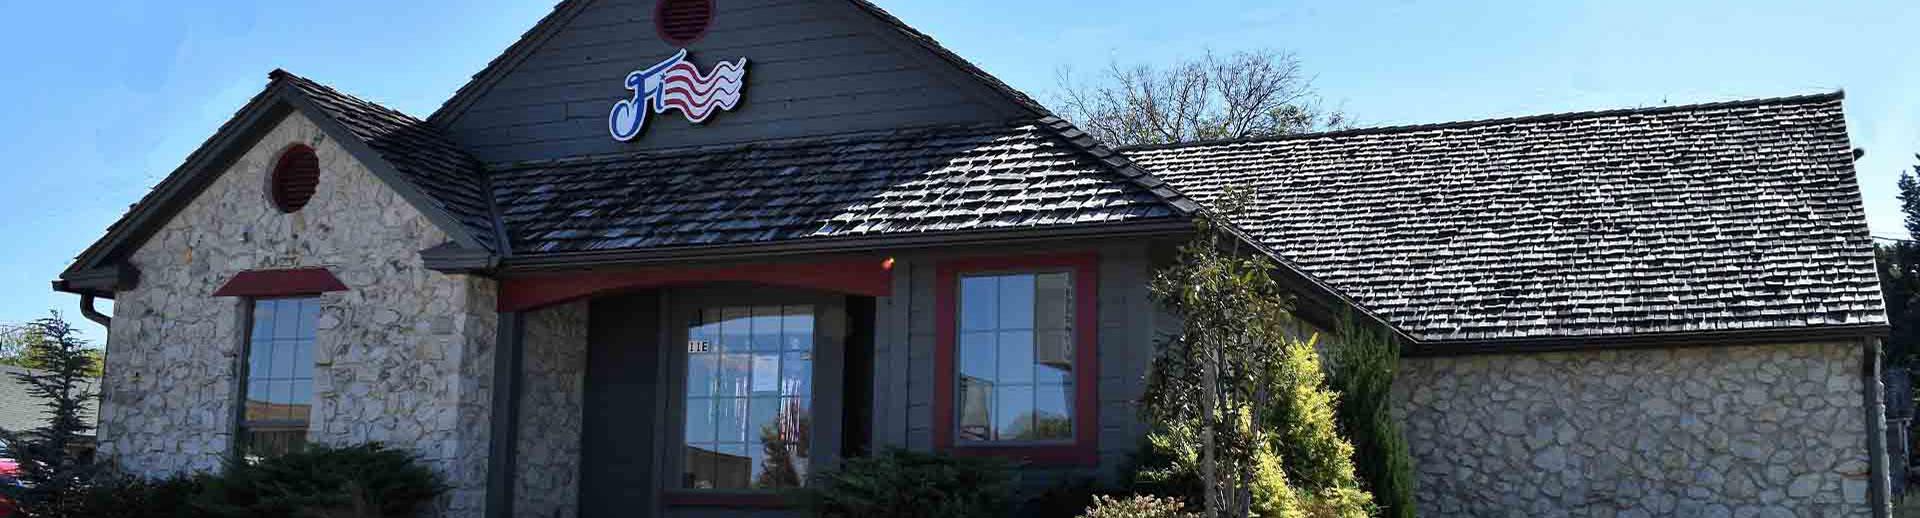 House Insurance in Moore, OK, Norman, OK, Oklahoma City